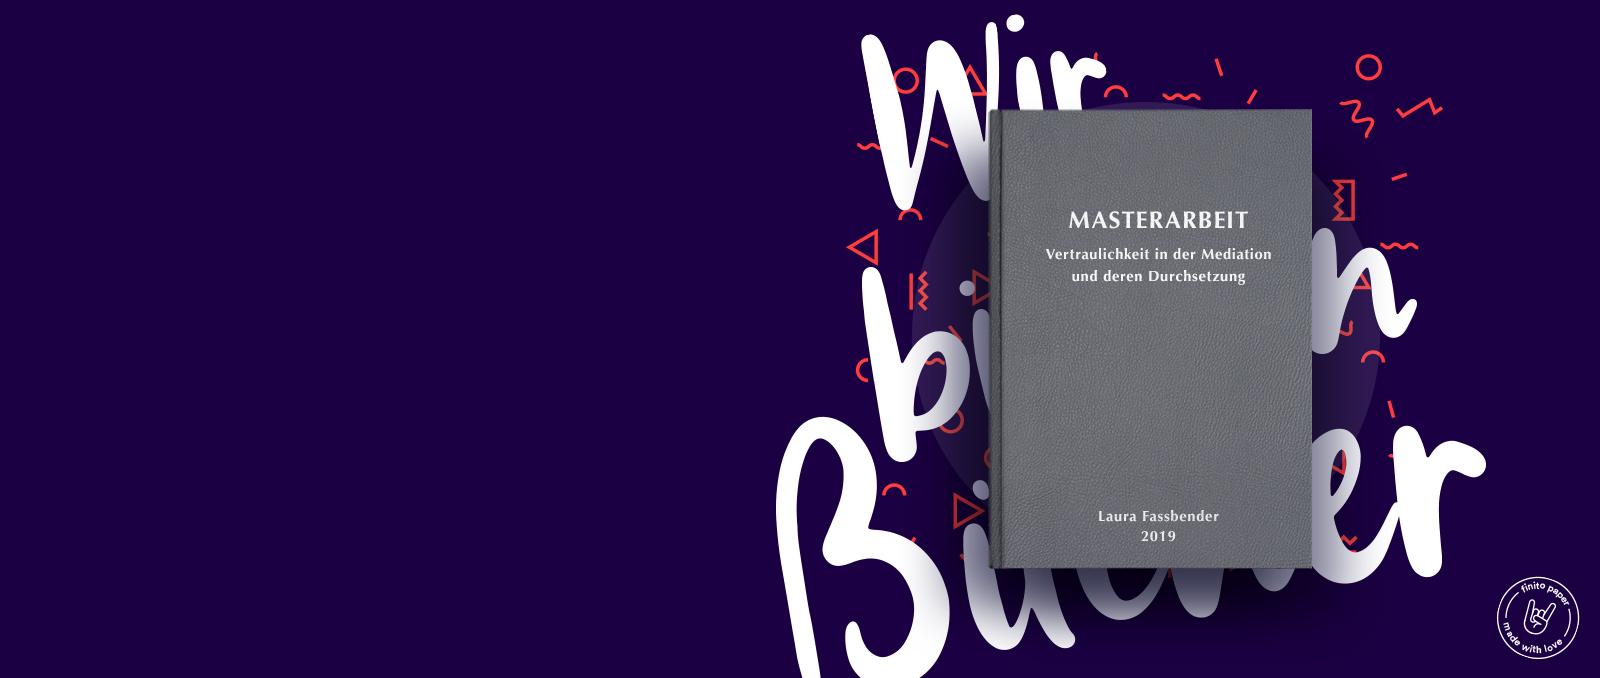 masterarbeit-drucken-binden-lassen-finito